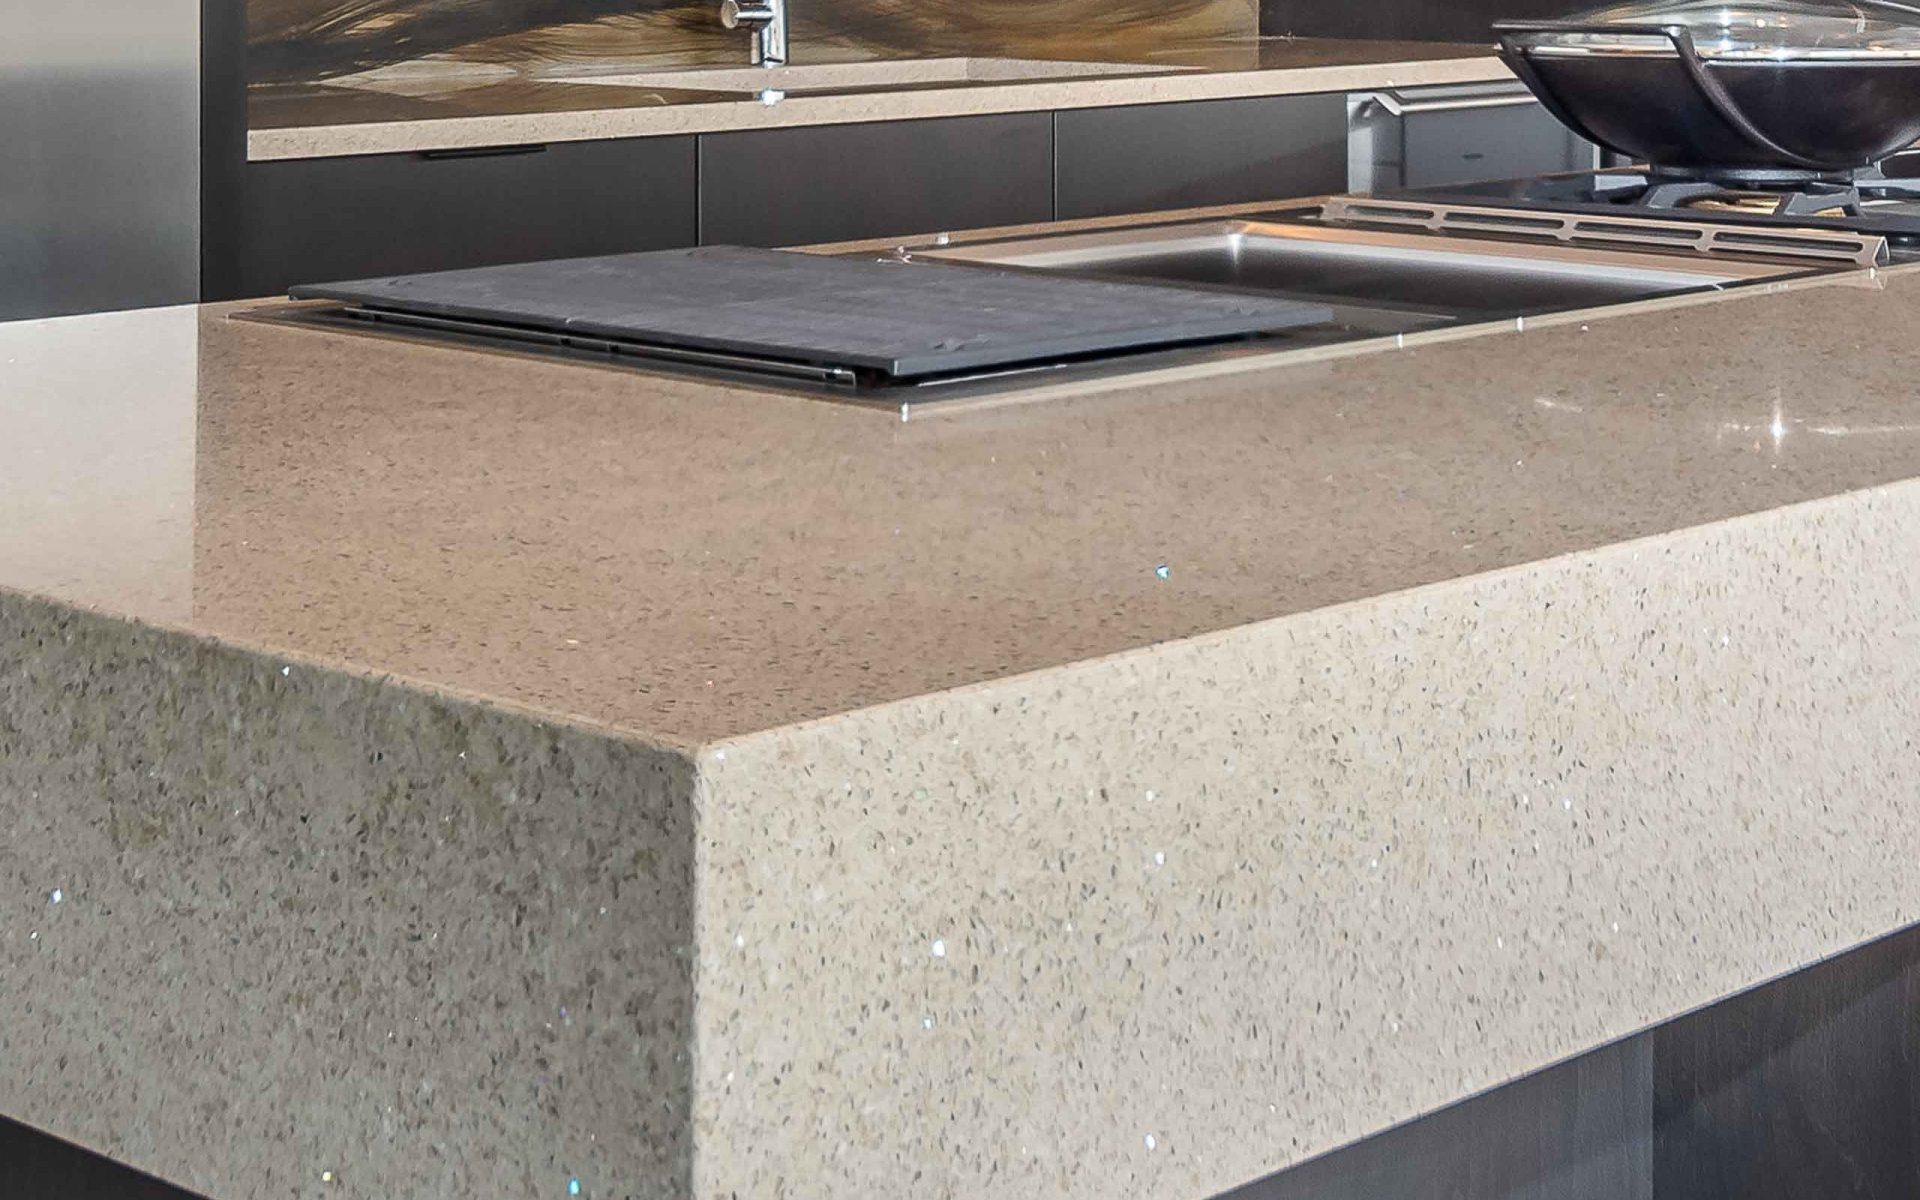 century-cabinets-Granite-Countertop-polish-heat-resistant.jpg